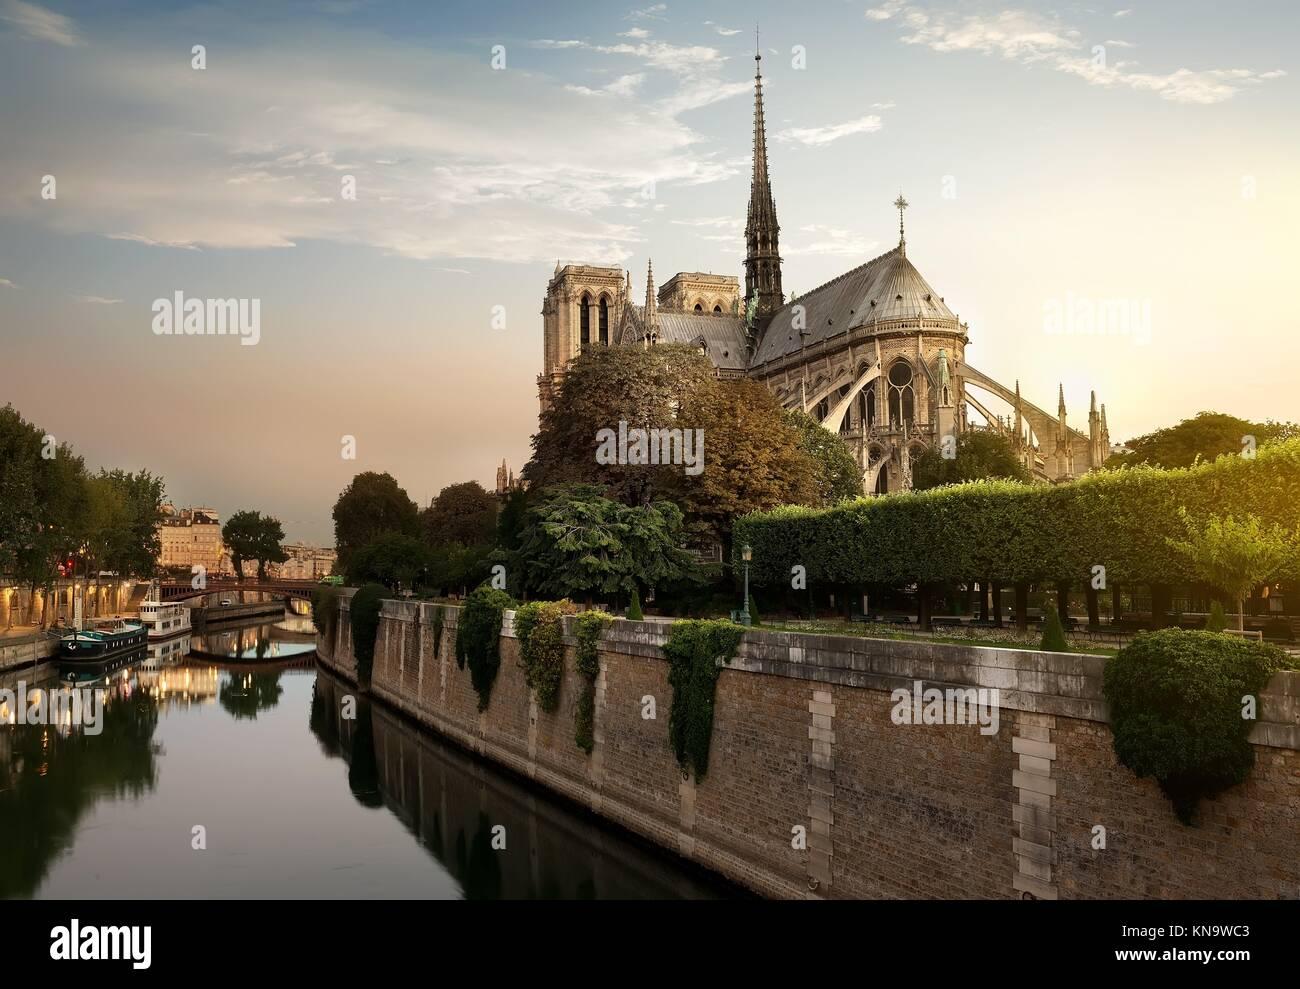 Sonnenuntergang über Notre Dame de Paris, Frankreich. Stockbild